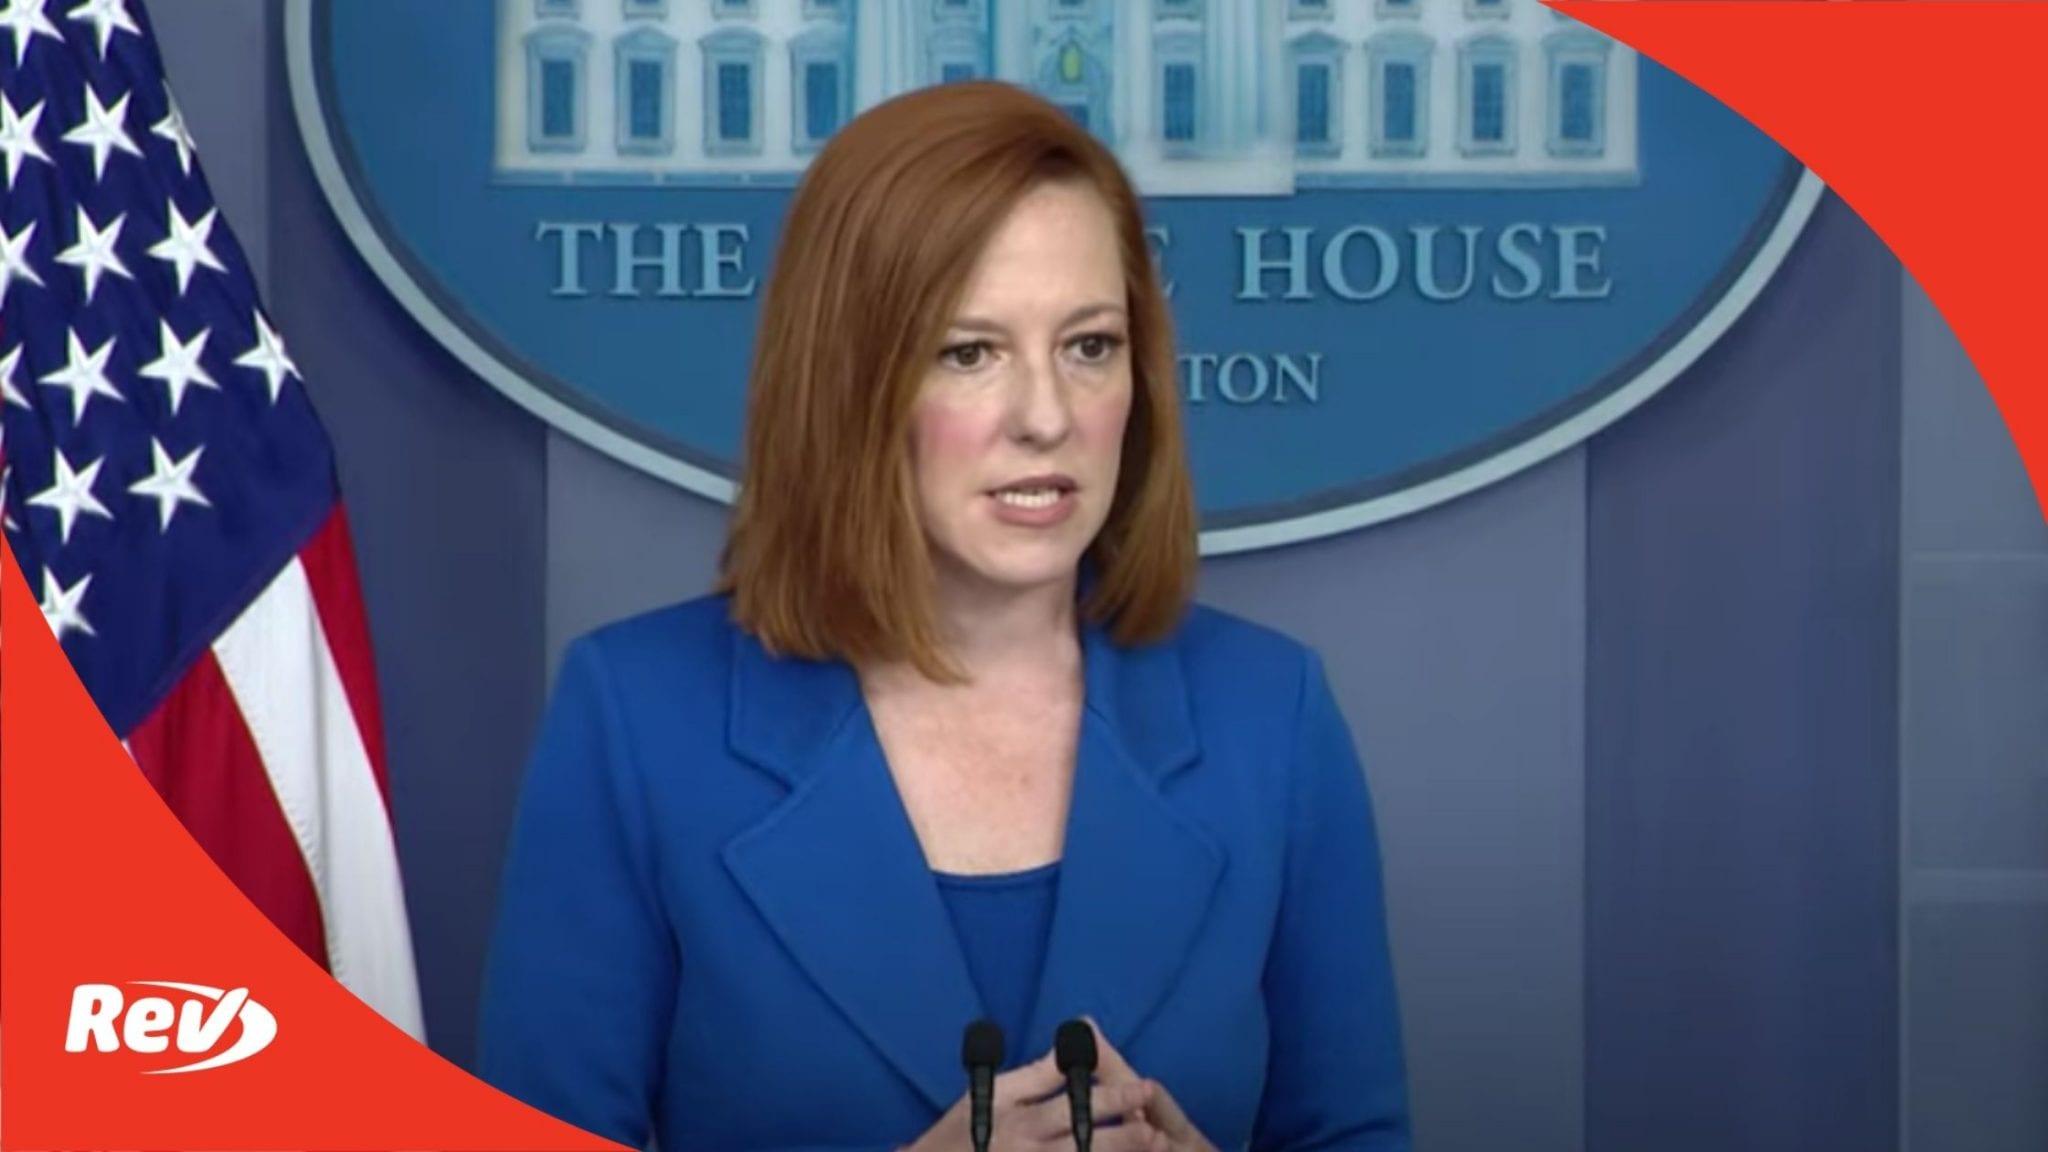 Press Secretary Jen Psaki White House Press Conference Transcript May 24